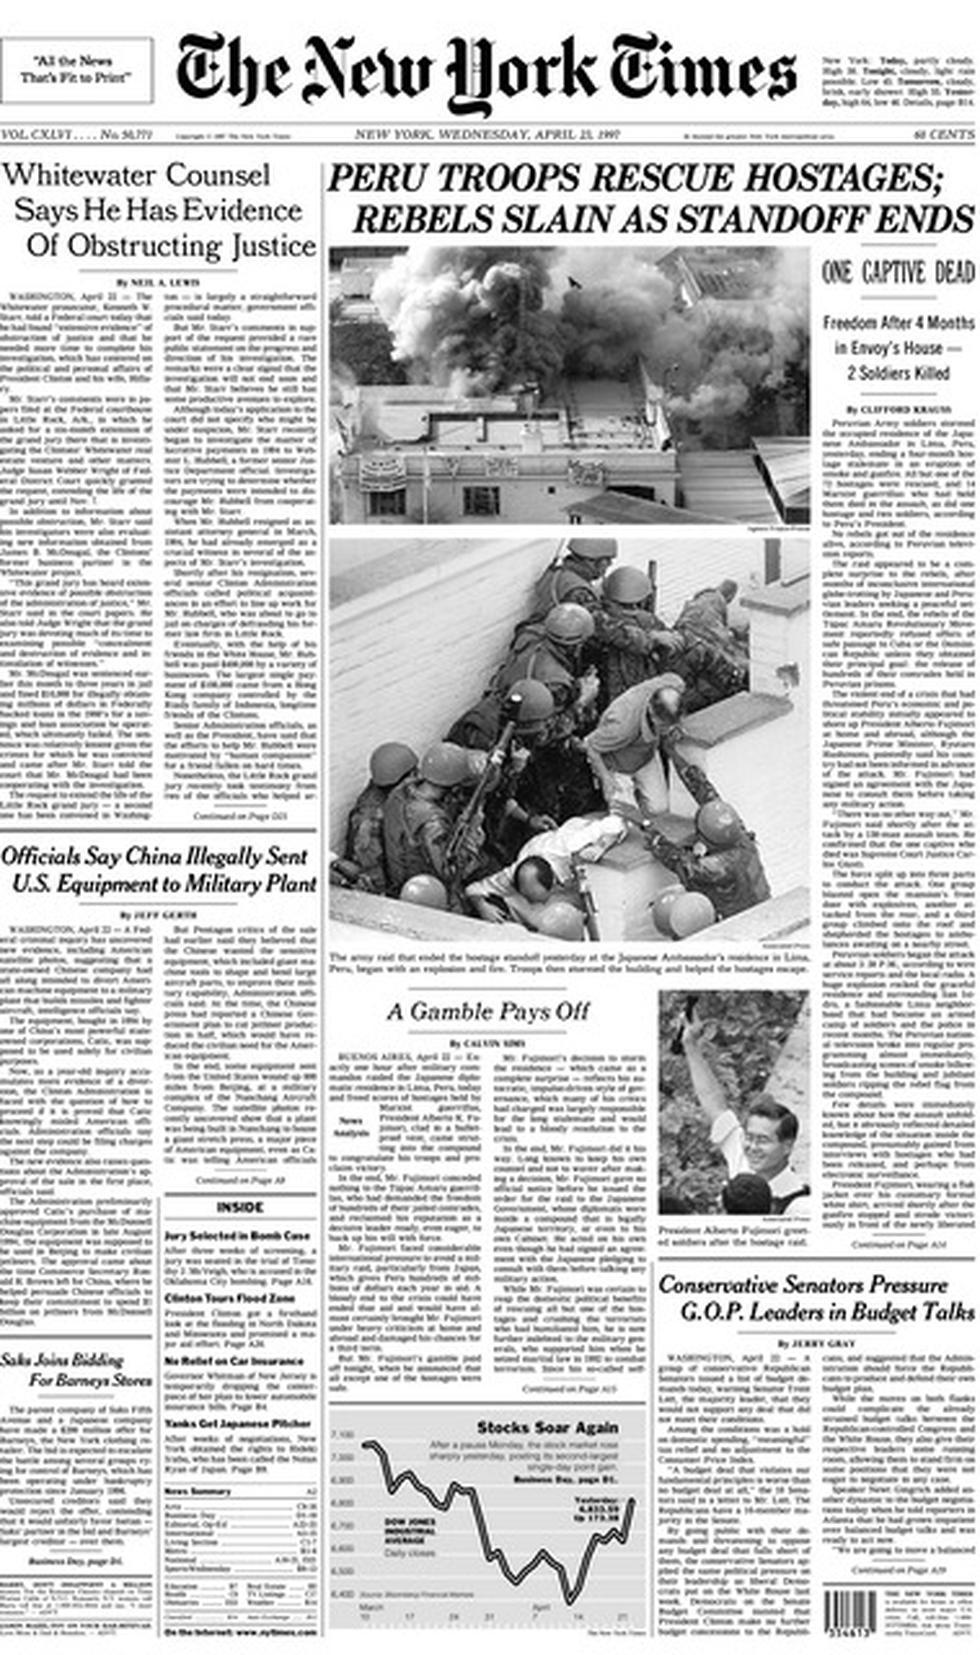 Portada de The New York Times de Estados Unidos.